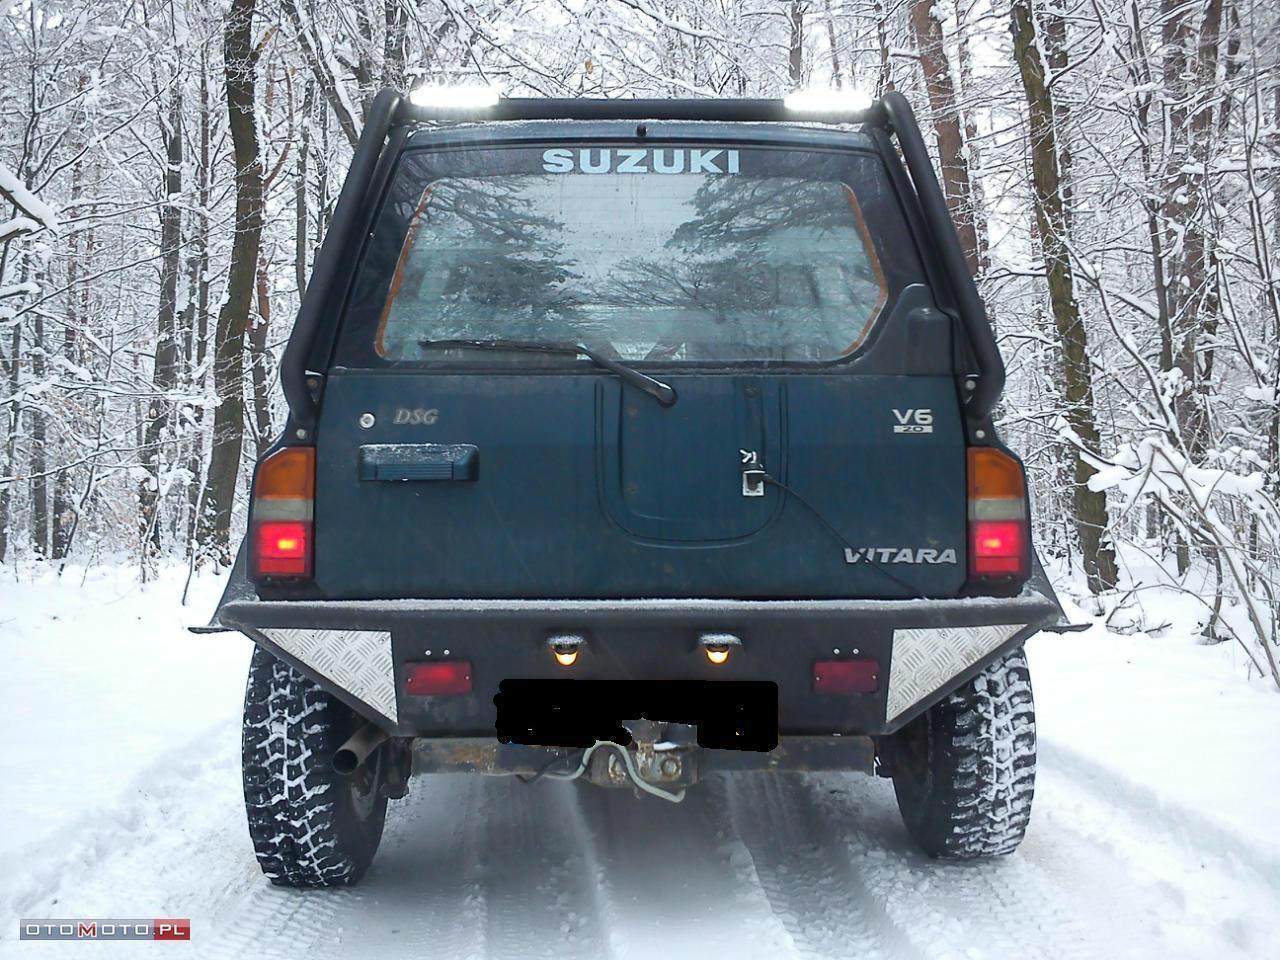 Suzuki Vitara 2.0V6 ,MOŻLIWA ZAMIANA